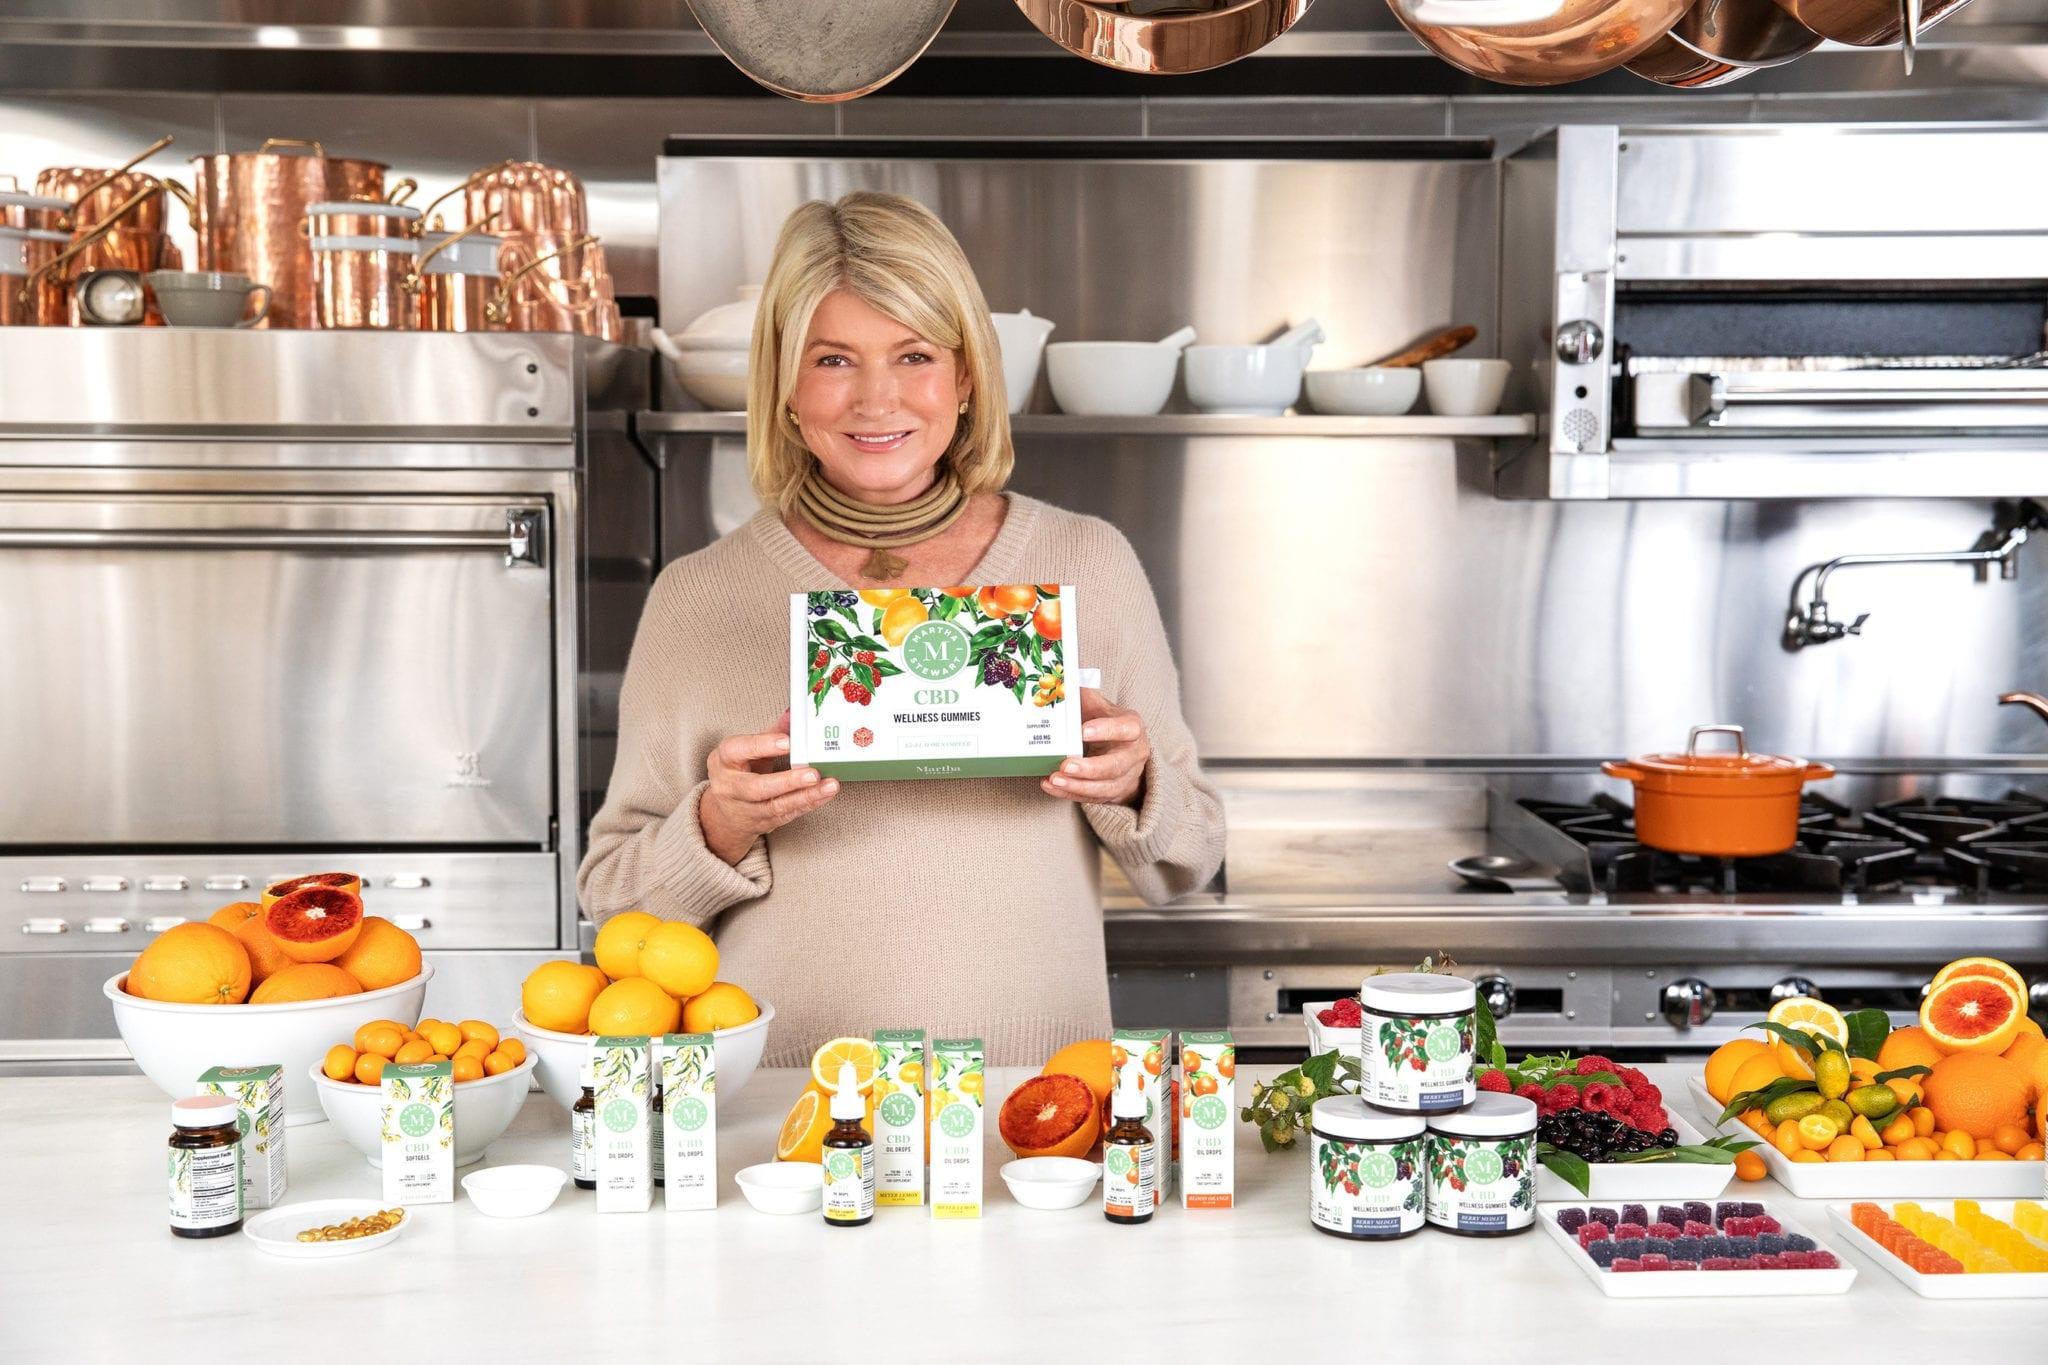 Canopy confident on profit predictions despite flat Q4 growth - Martha Stewart